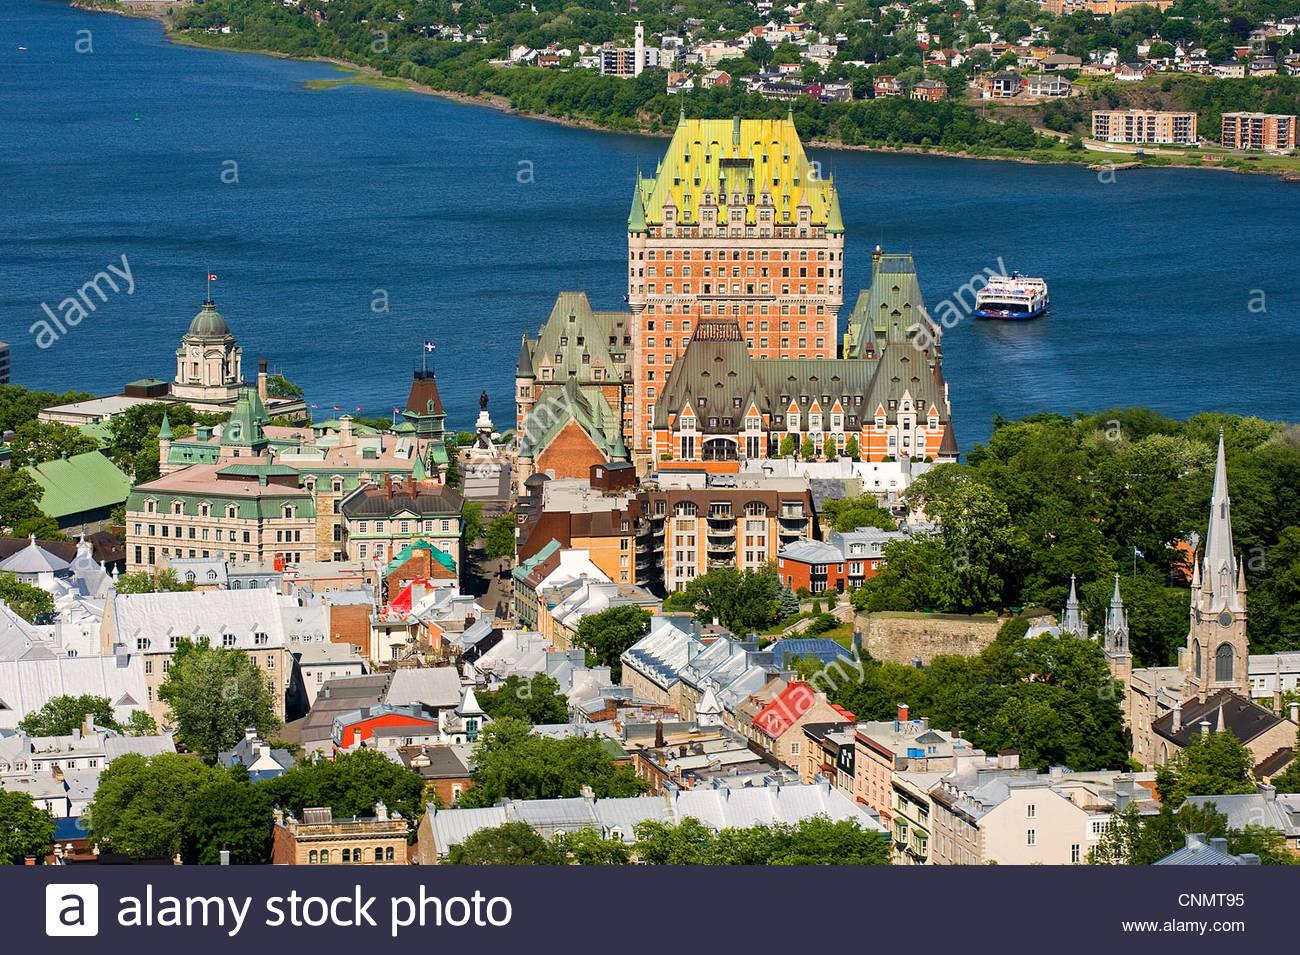 chateau frontenac and saint laurent river, quebec city, quebec, canada - Stock Image